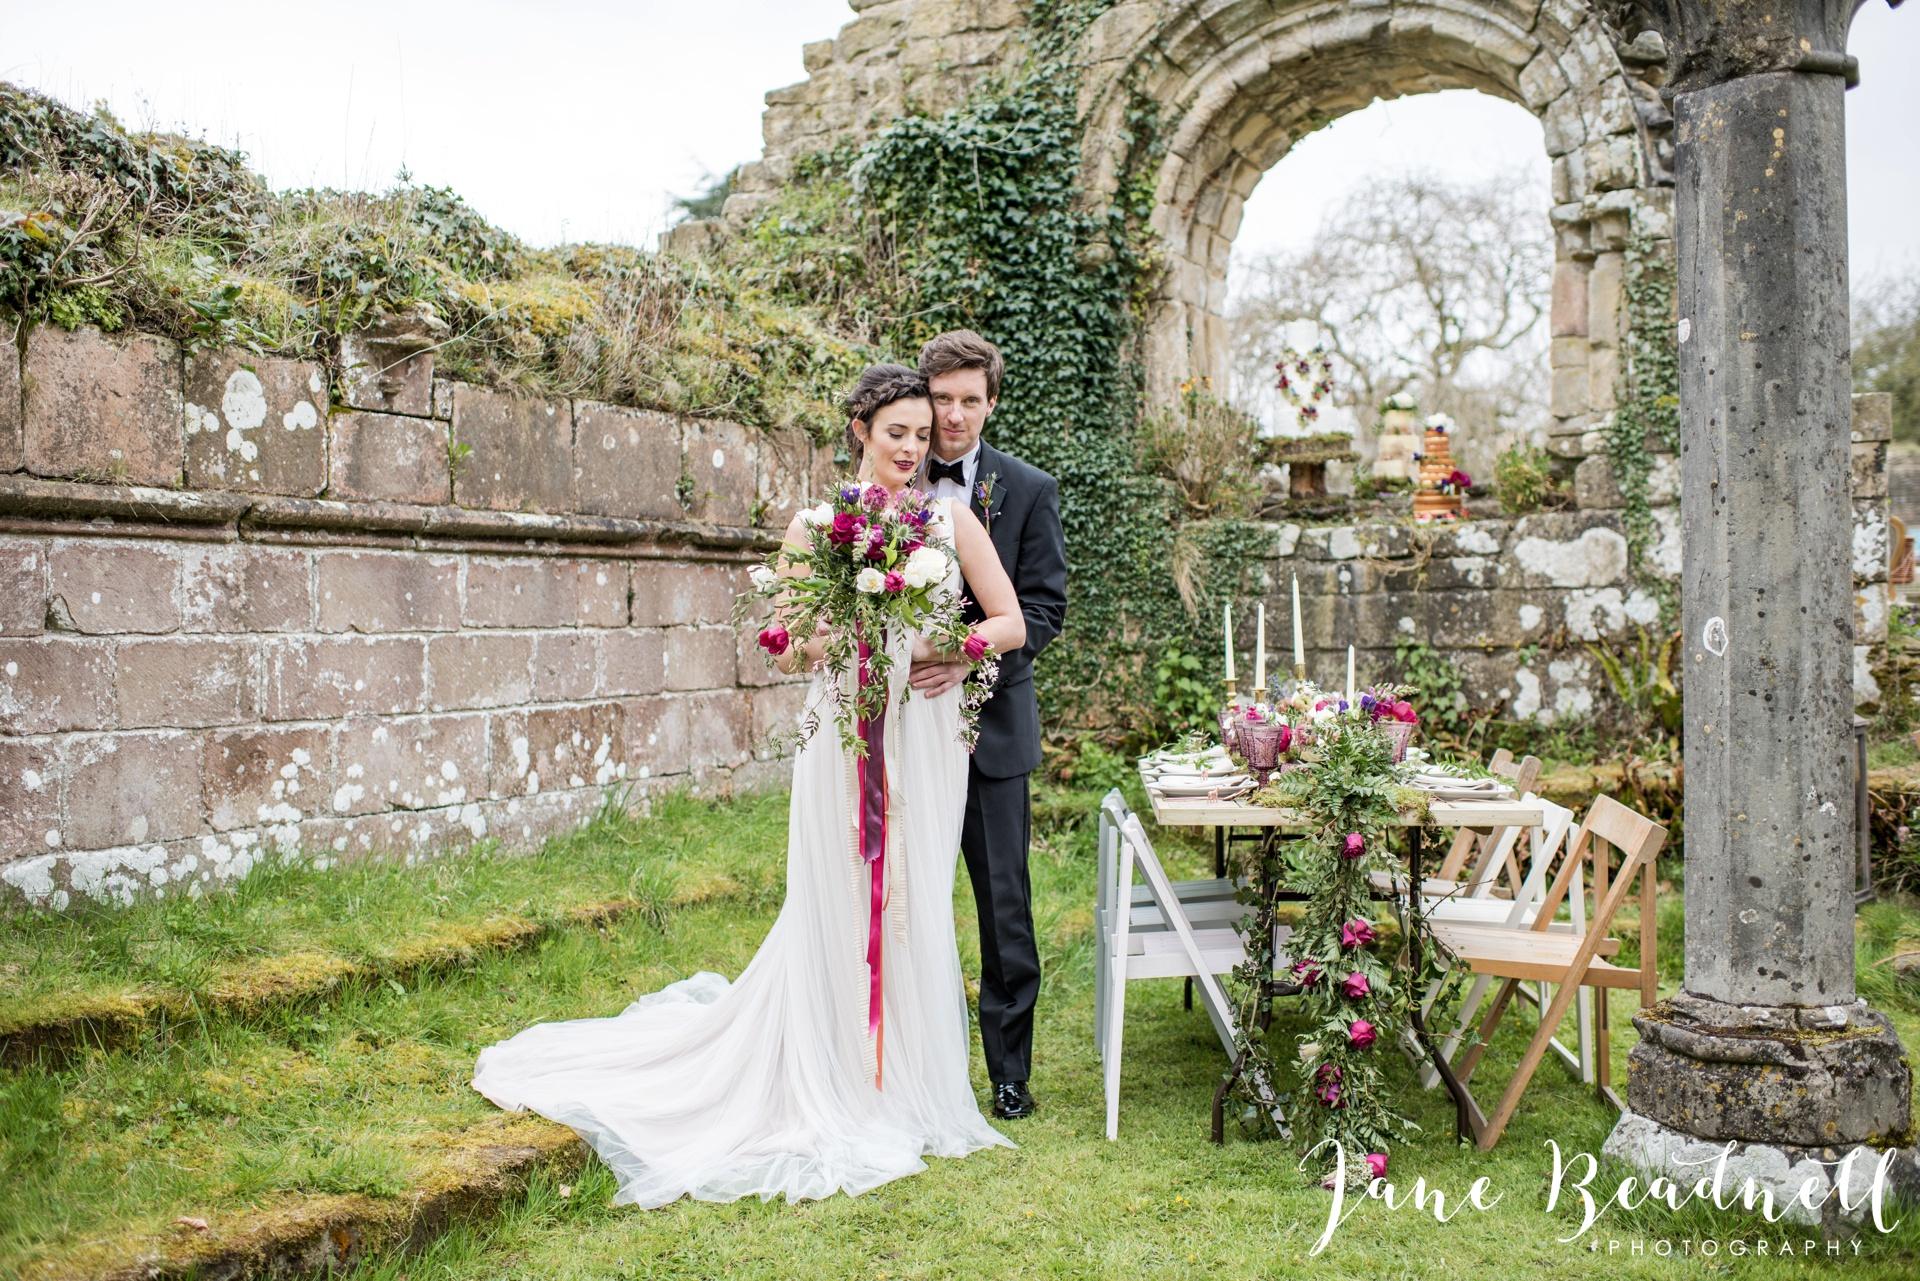 Jervaulx Abbey wedding photography fine art Yorkshire wedding photographer jane beadnell_0028